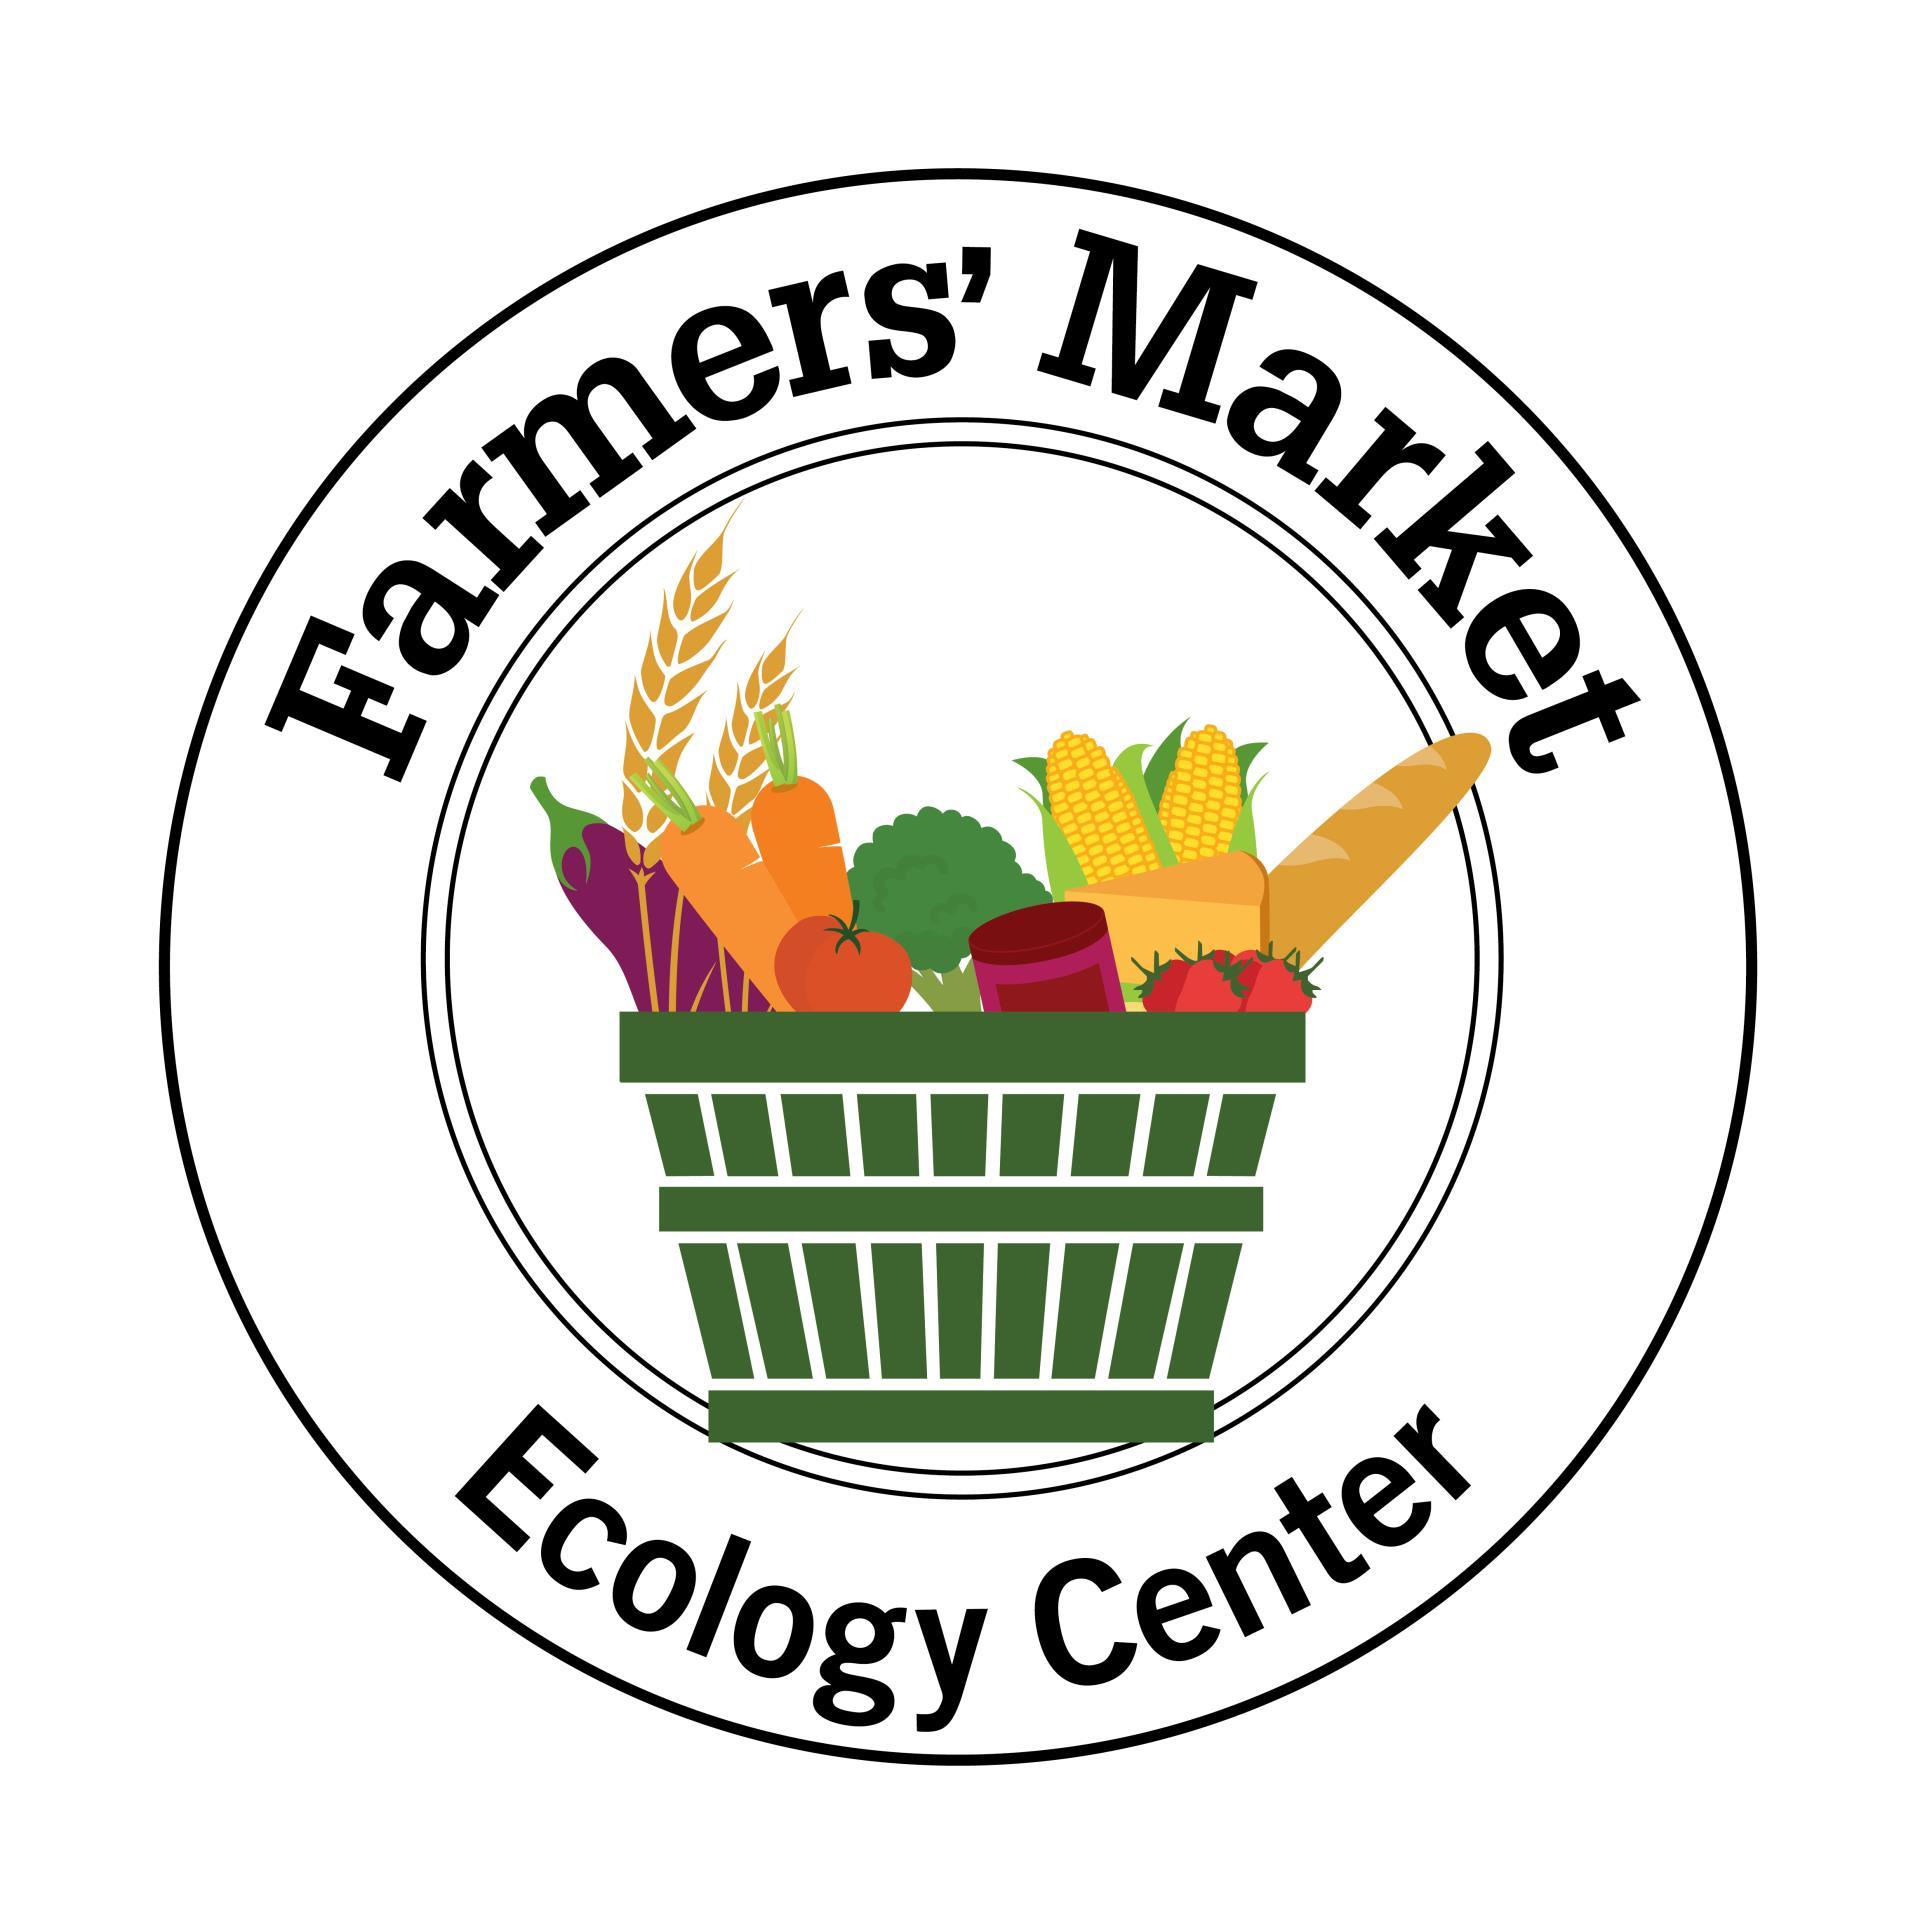 EcologyCenter_Farmers Market logo_2015_LG-01